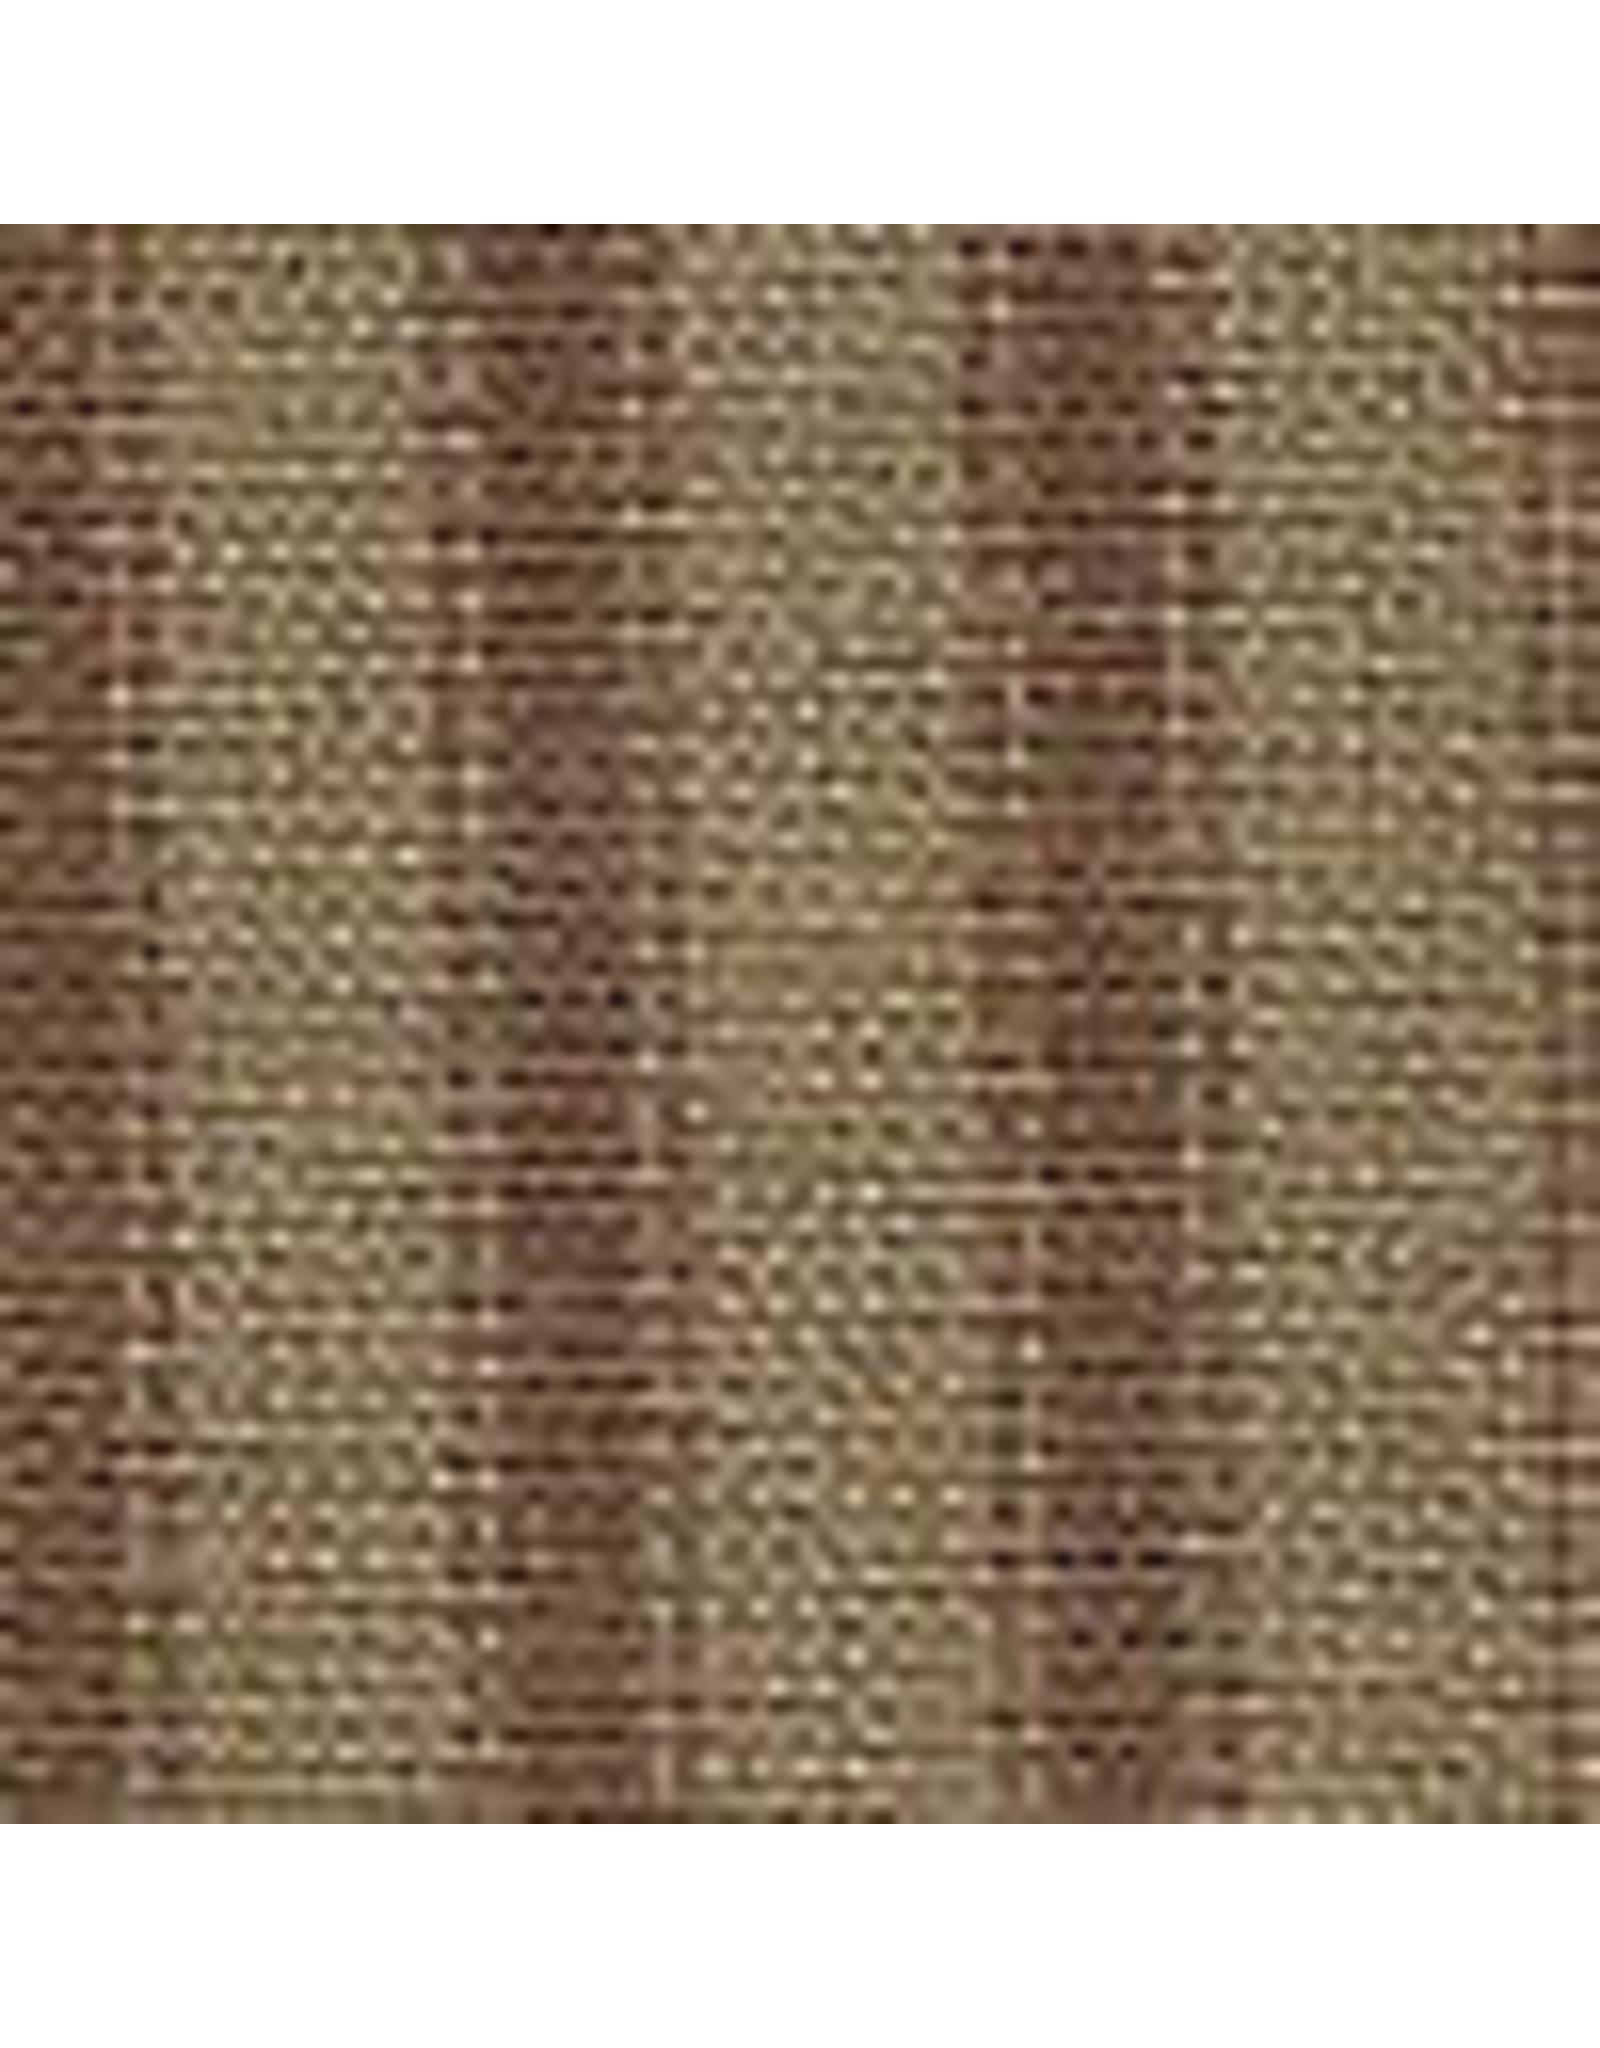 Yd. Brown and Tan Ticking Stripe Fabric #96